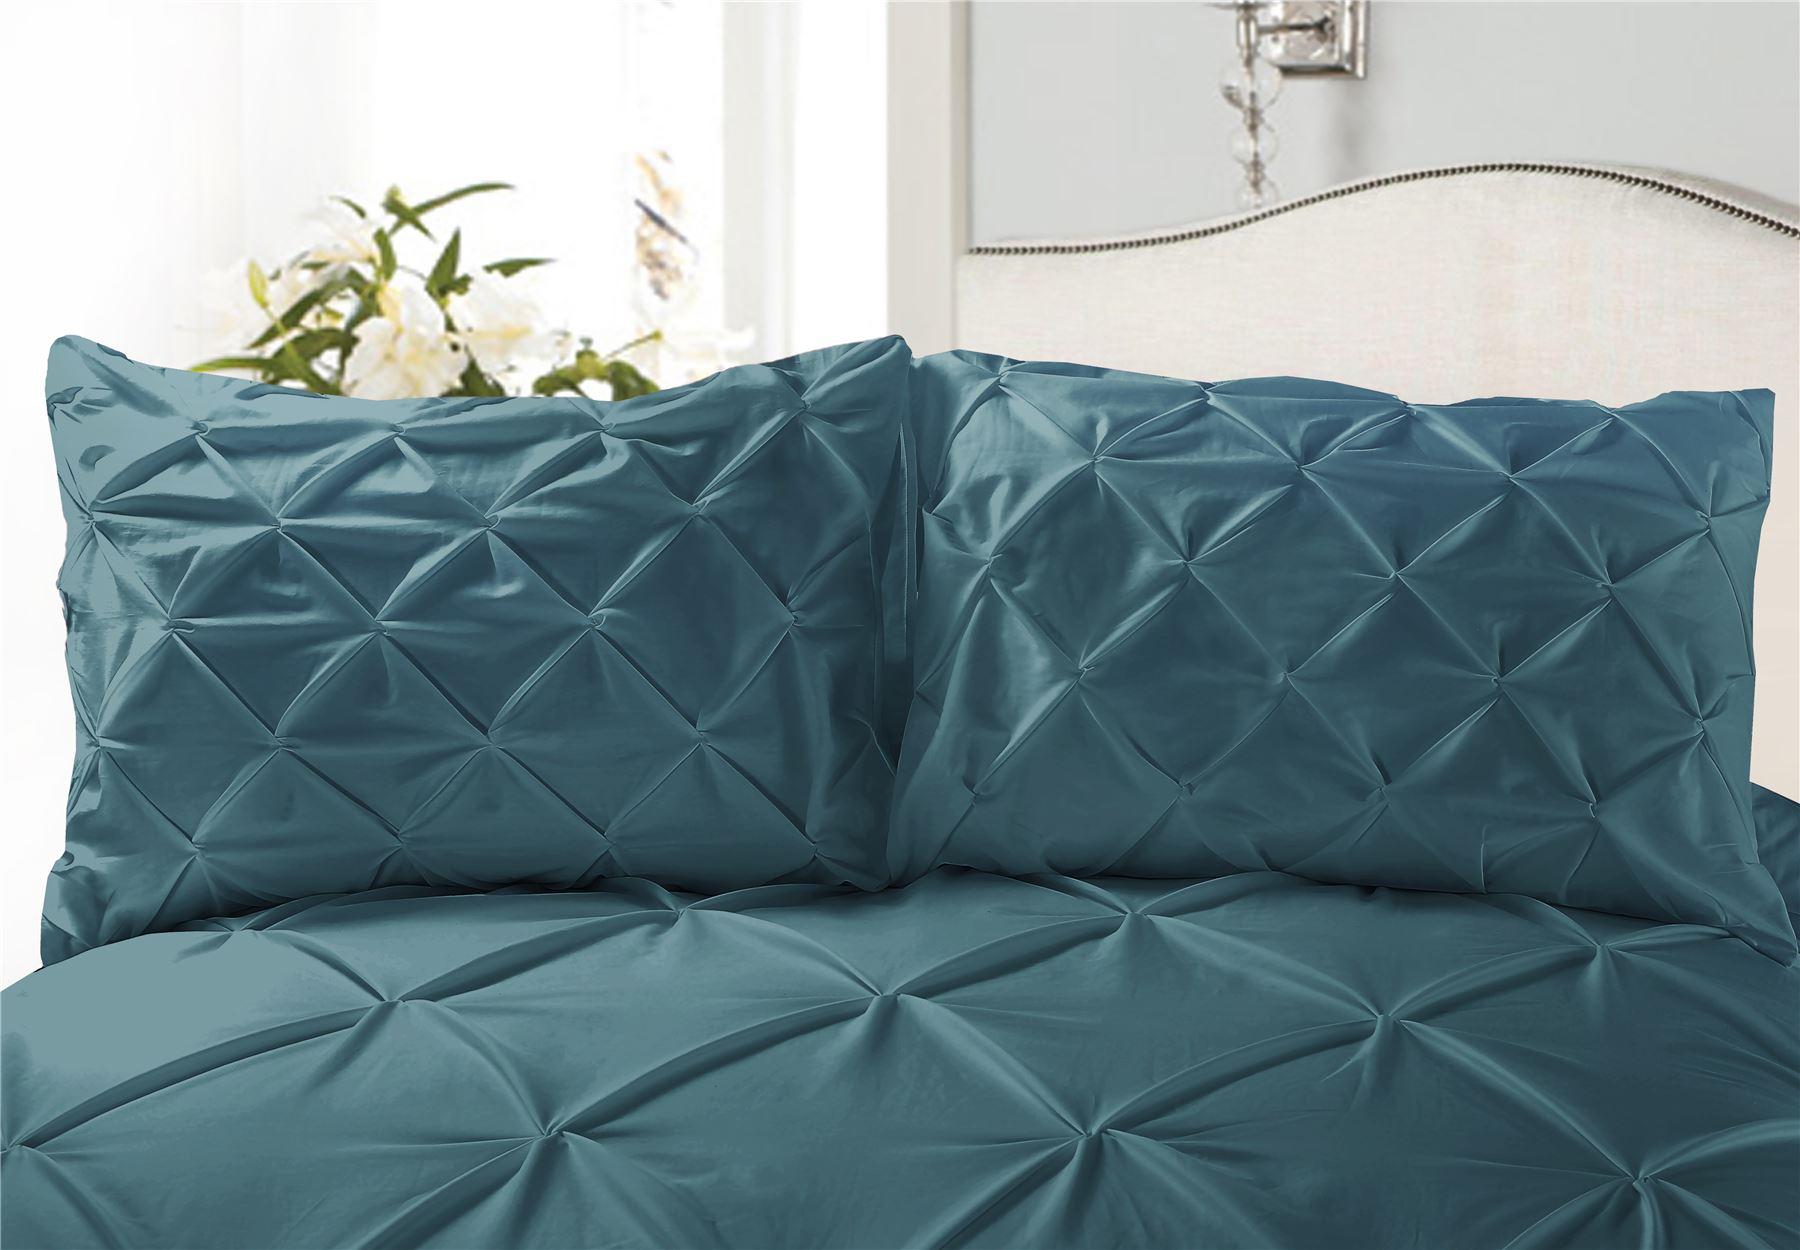 Luxury-Pure-100-Cotton-200-Thread-Pinch-Pleat-Pintuck-Puckering-Duvet-Cover-Set thumbnail 59